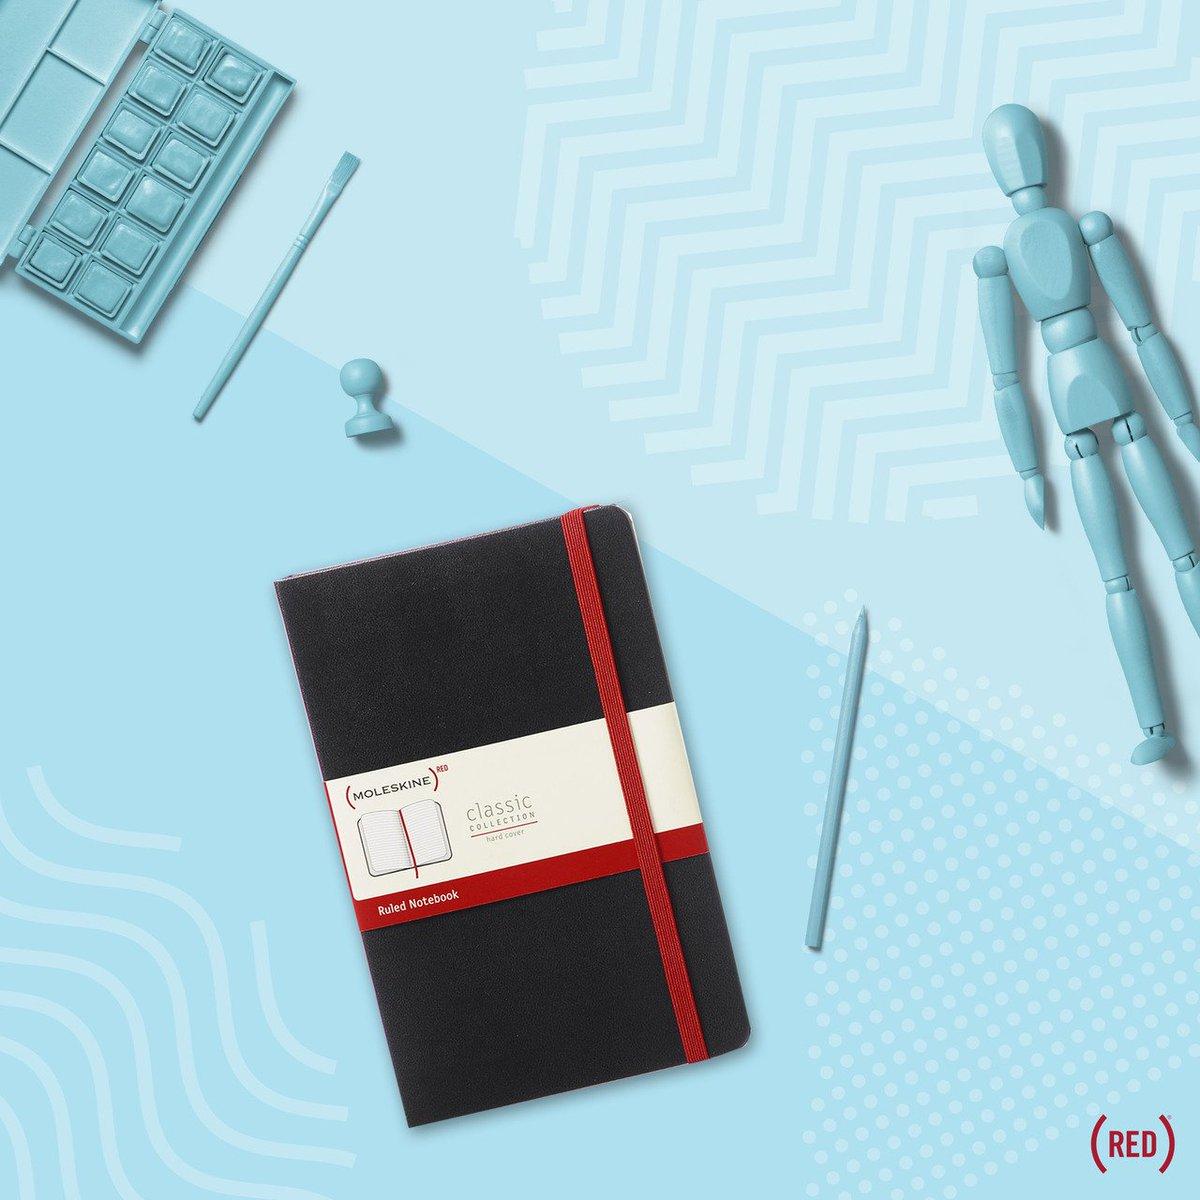 The best creative companion? A notebook that fights AIDS.   #backtoschool <br>http://pic.twitter.com/71iEKj1aPN